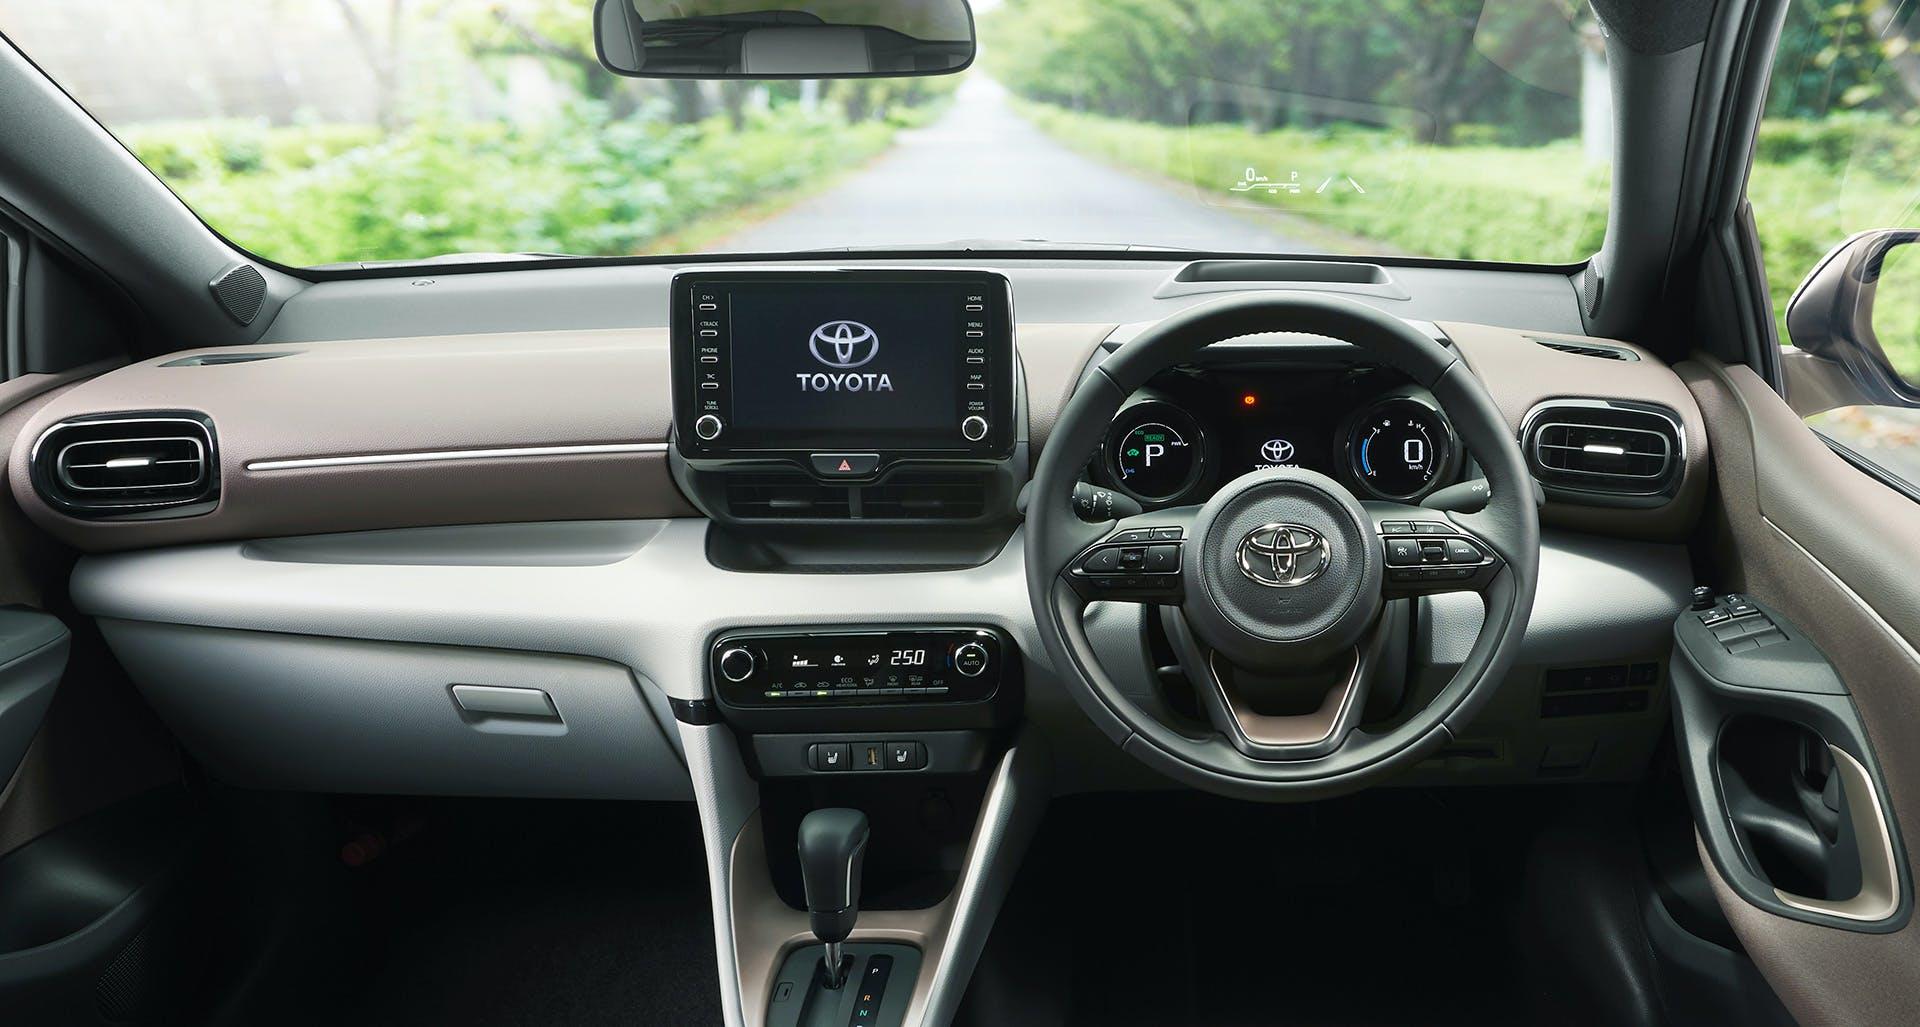 Nuova Toyota Yaris plancia